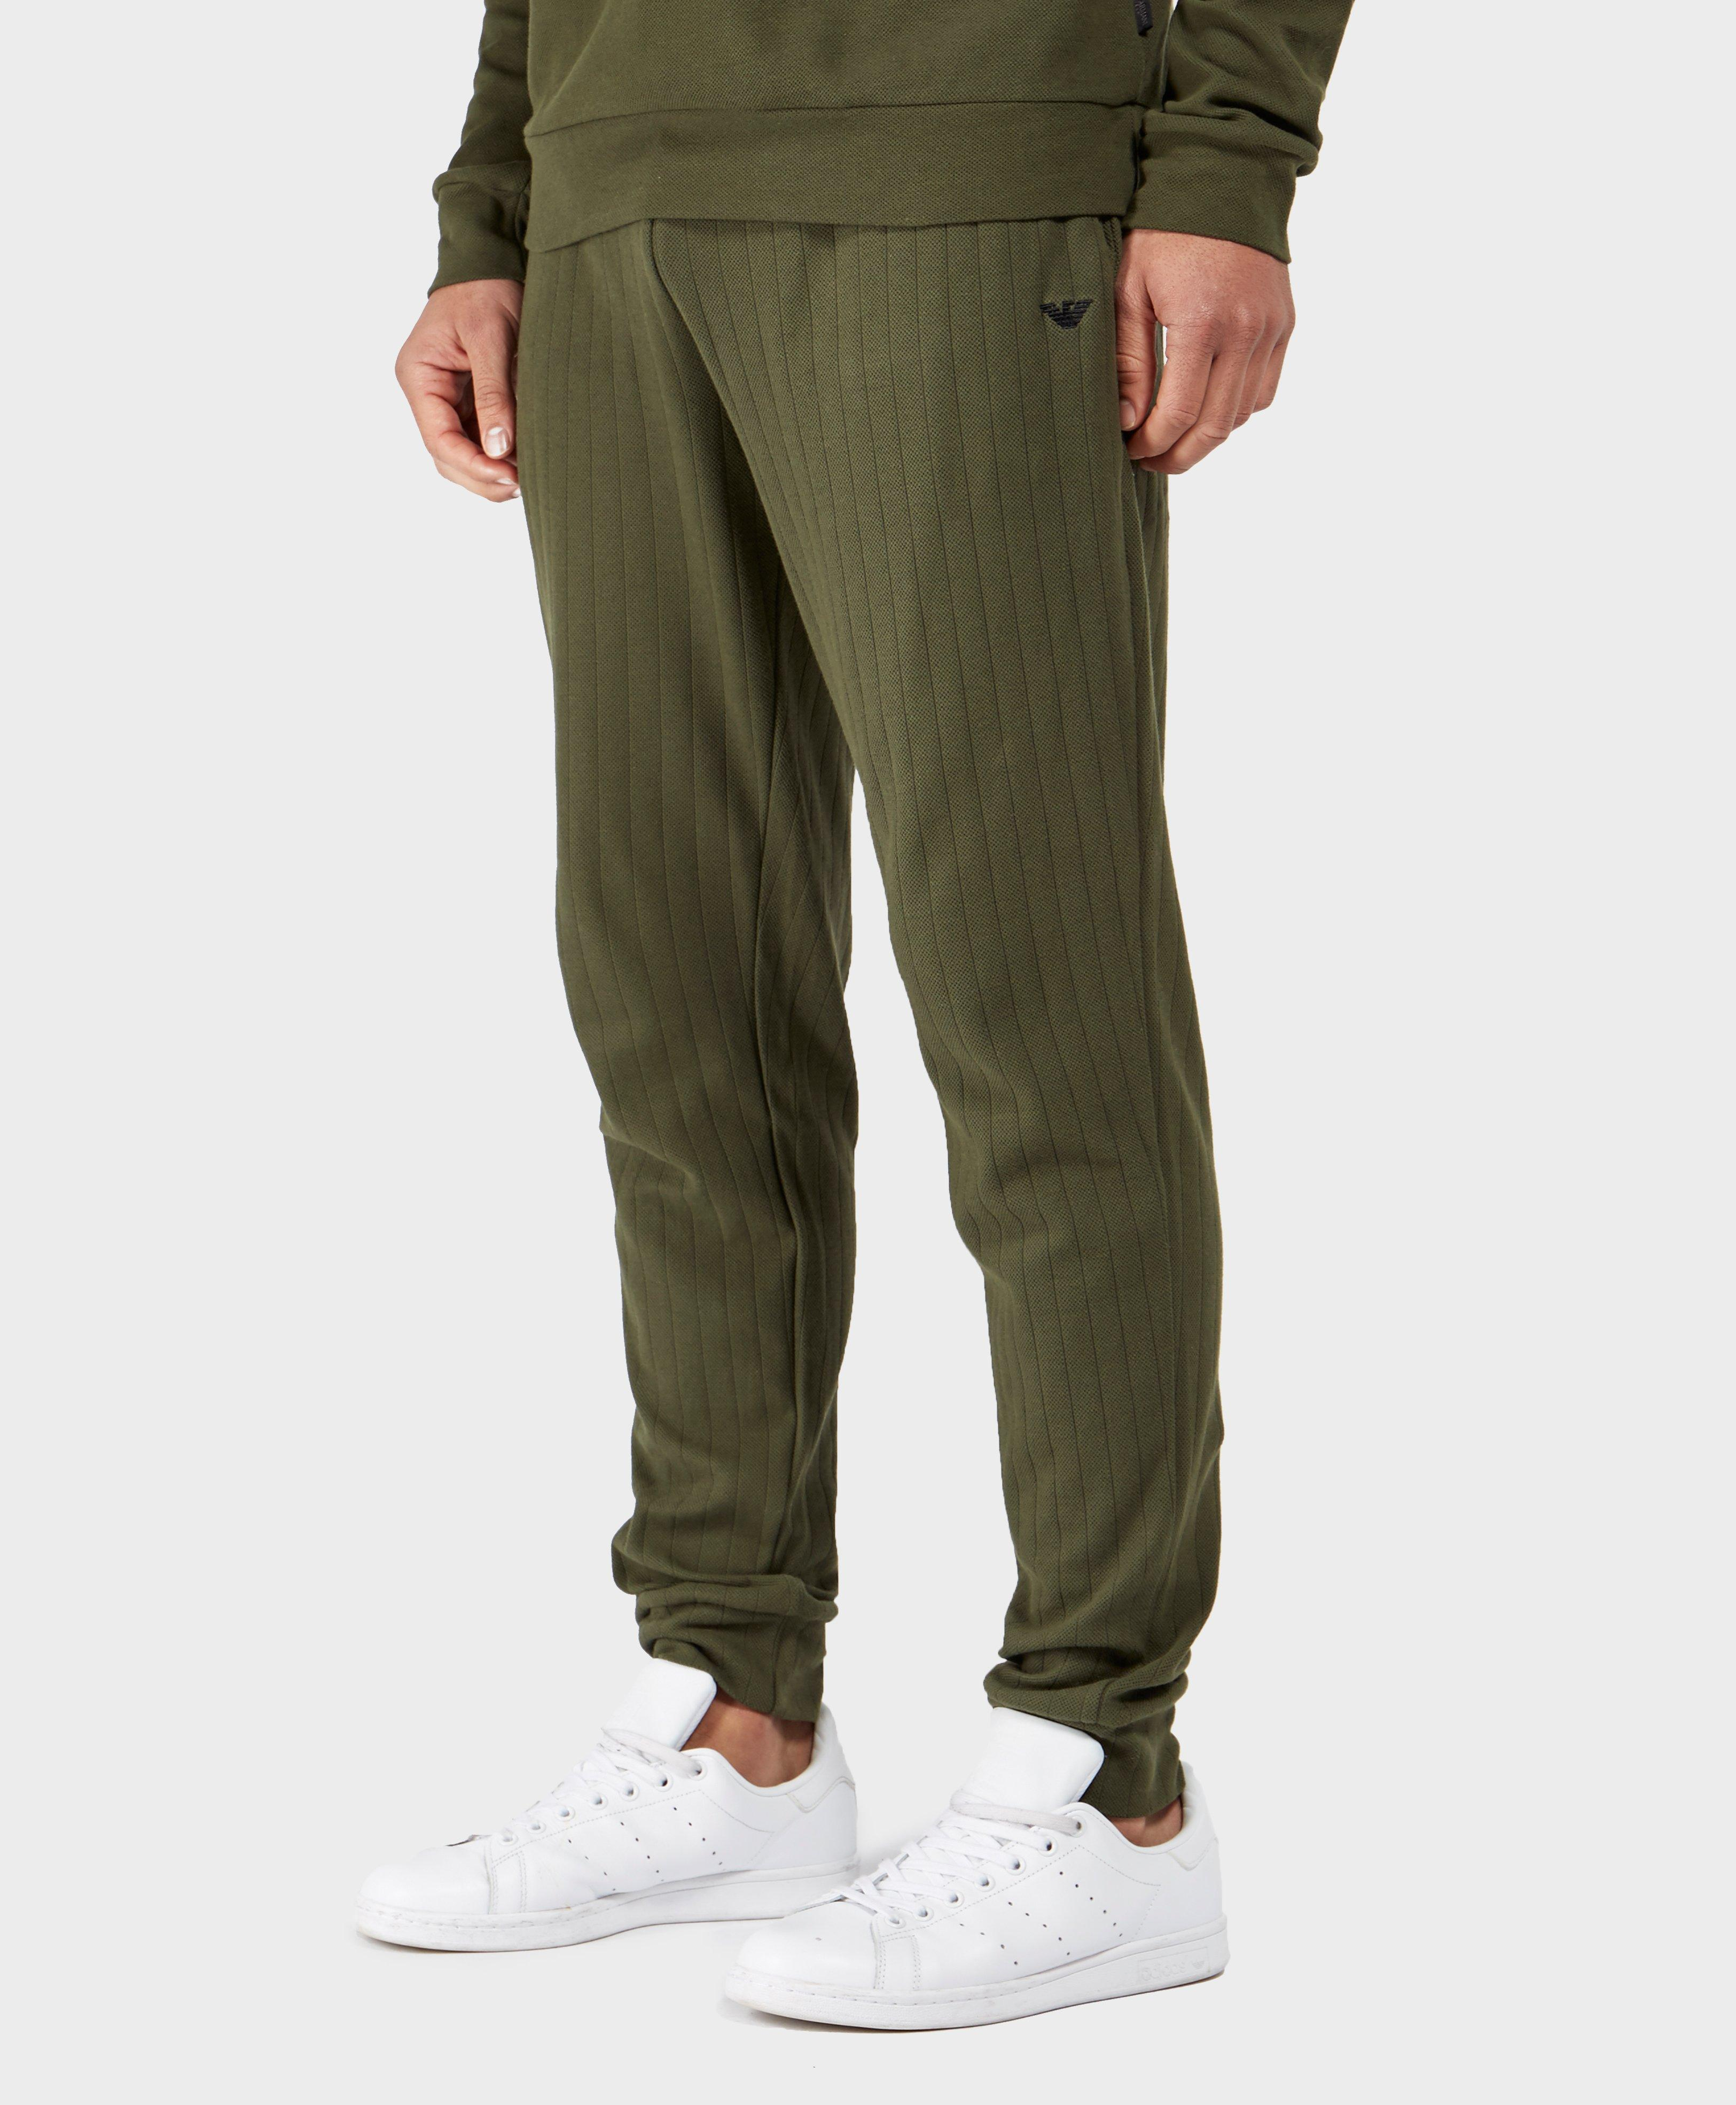 logo side stripe track pants - Green Emporio Armani Buy Cheap Low Shipping Real Online XiRojatft